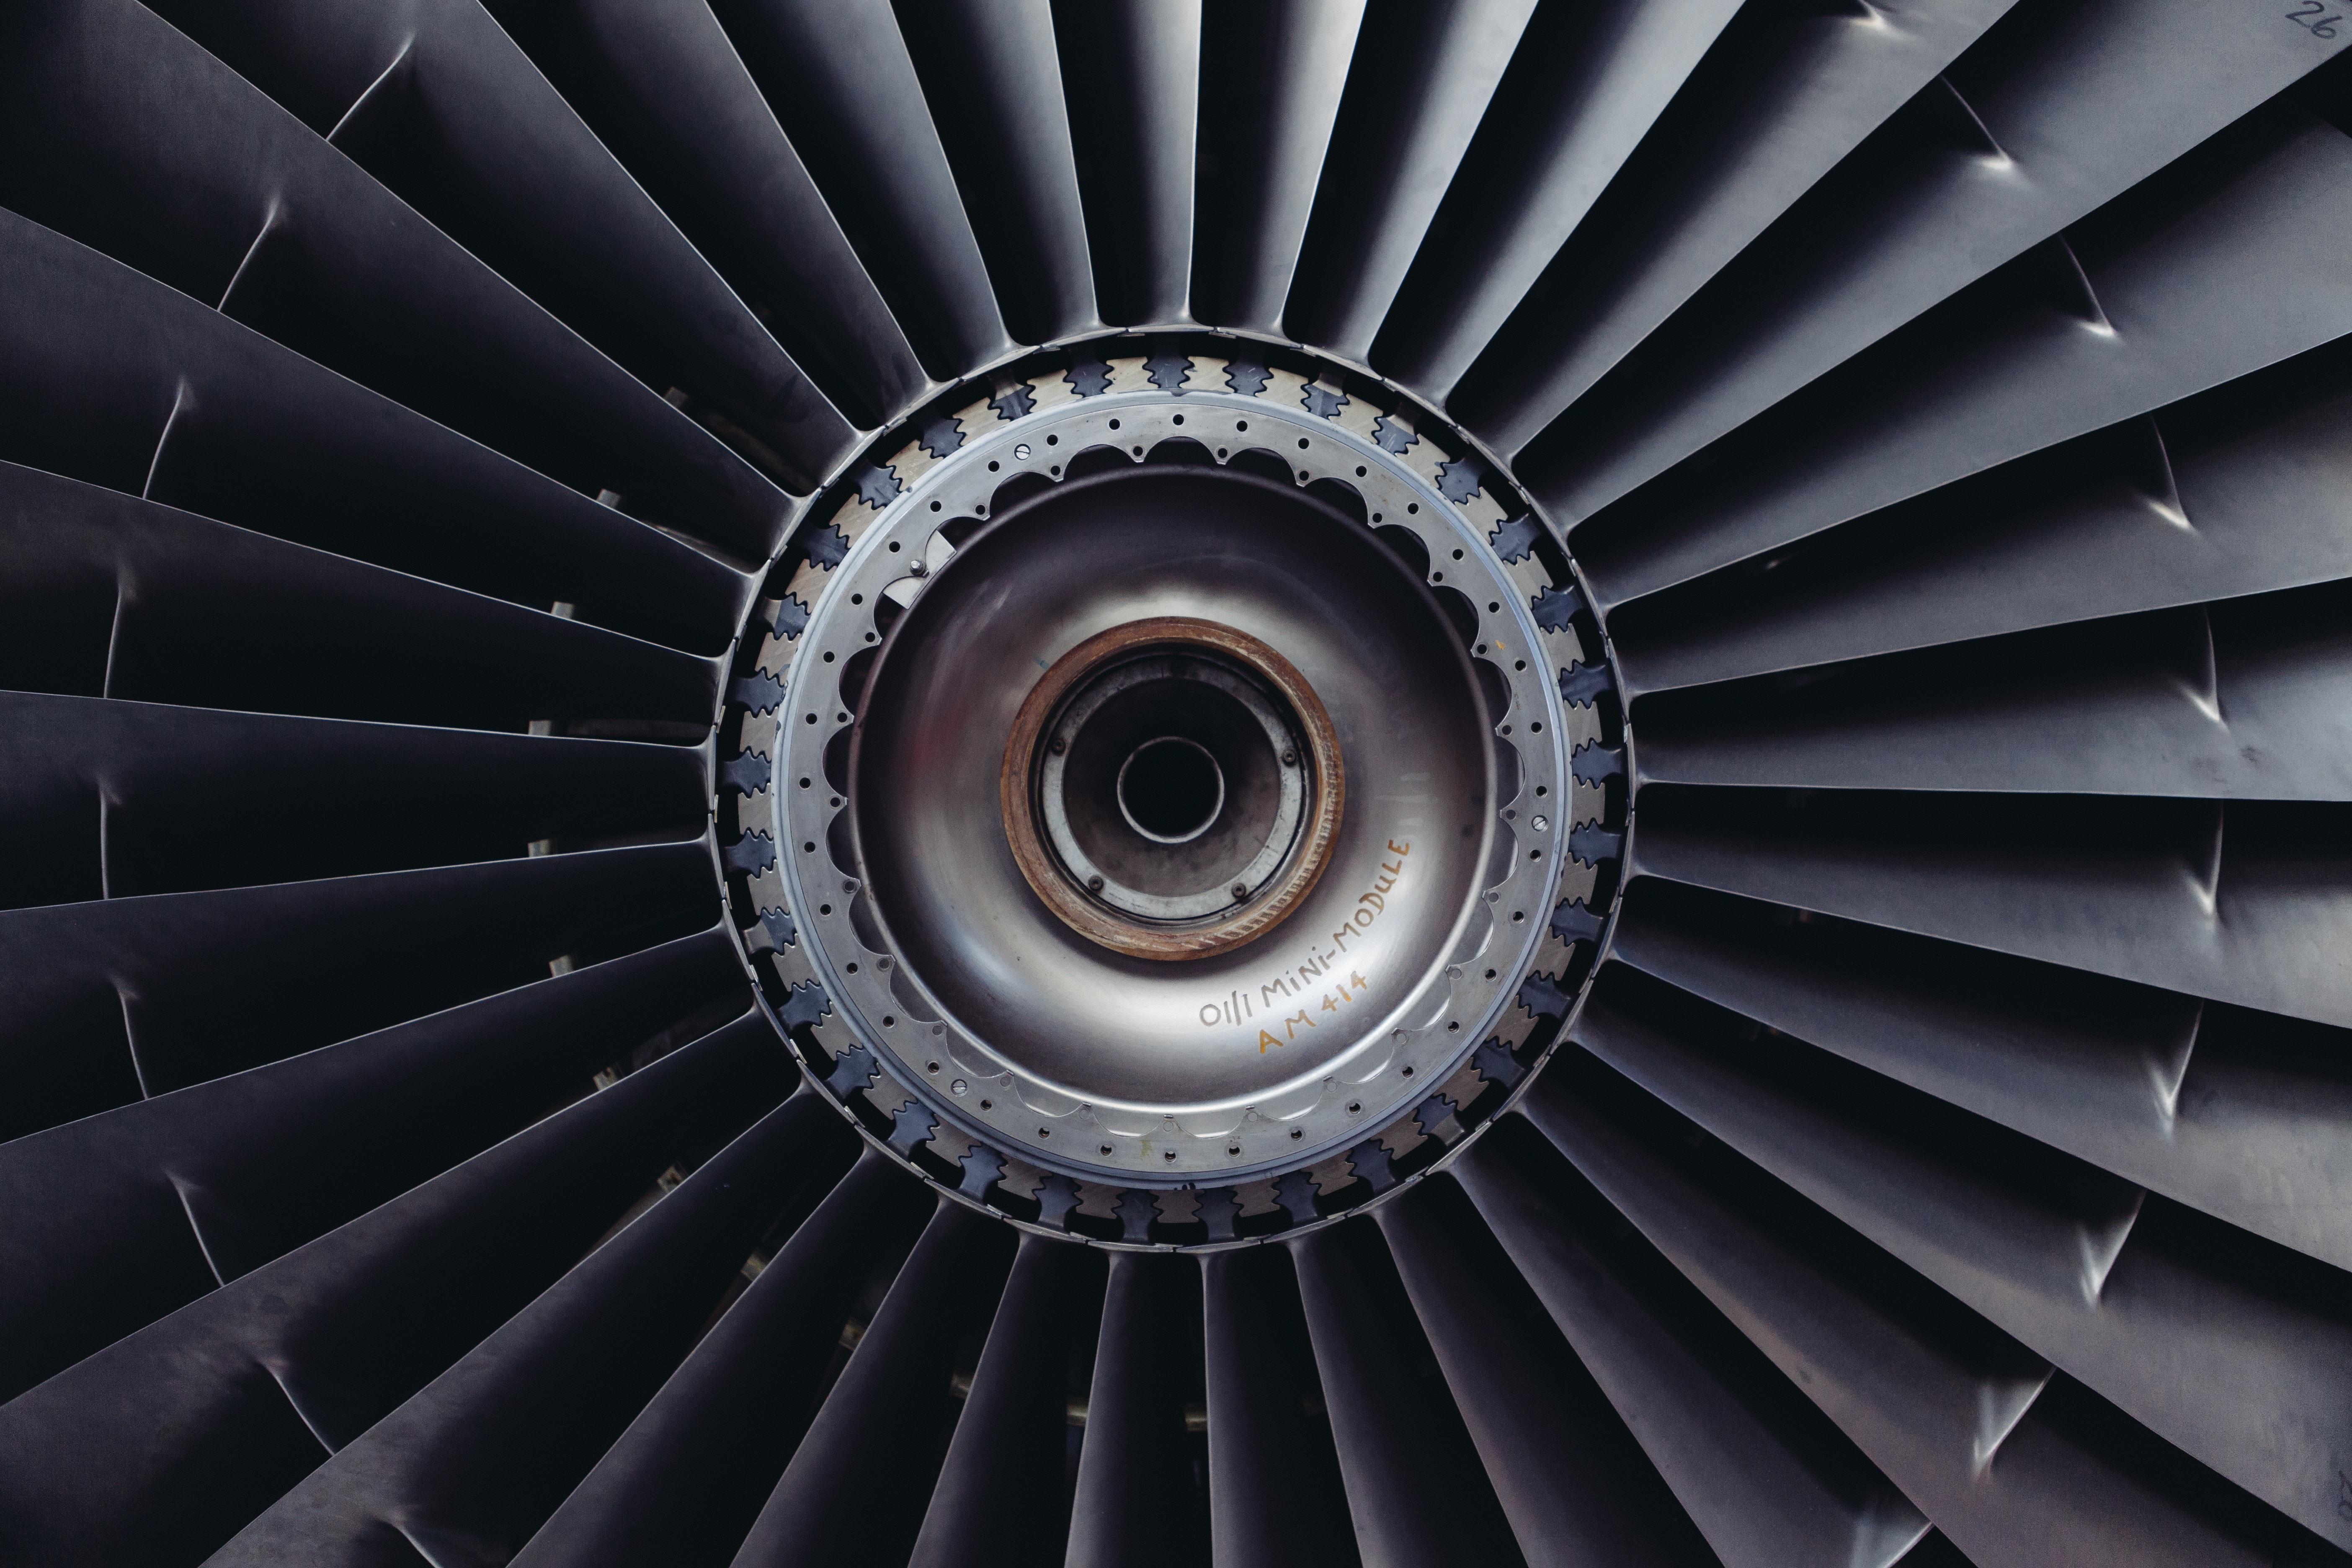 Free stock photo of airplane engine jet